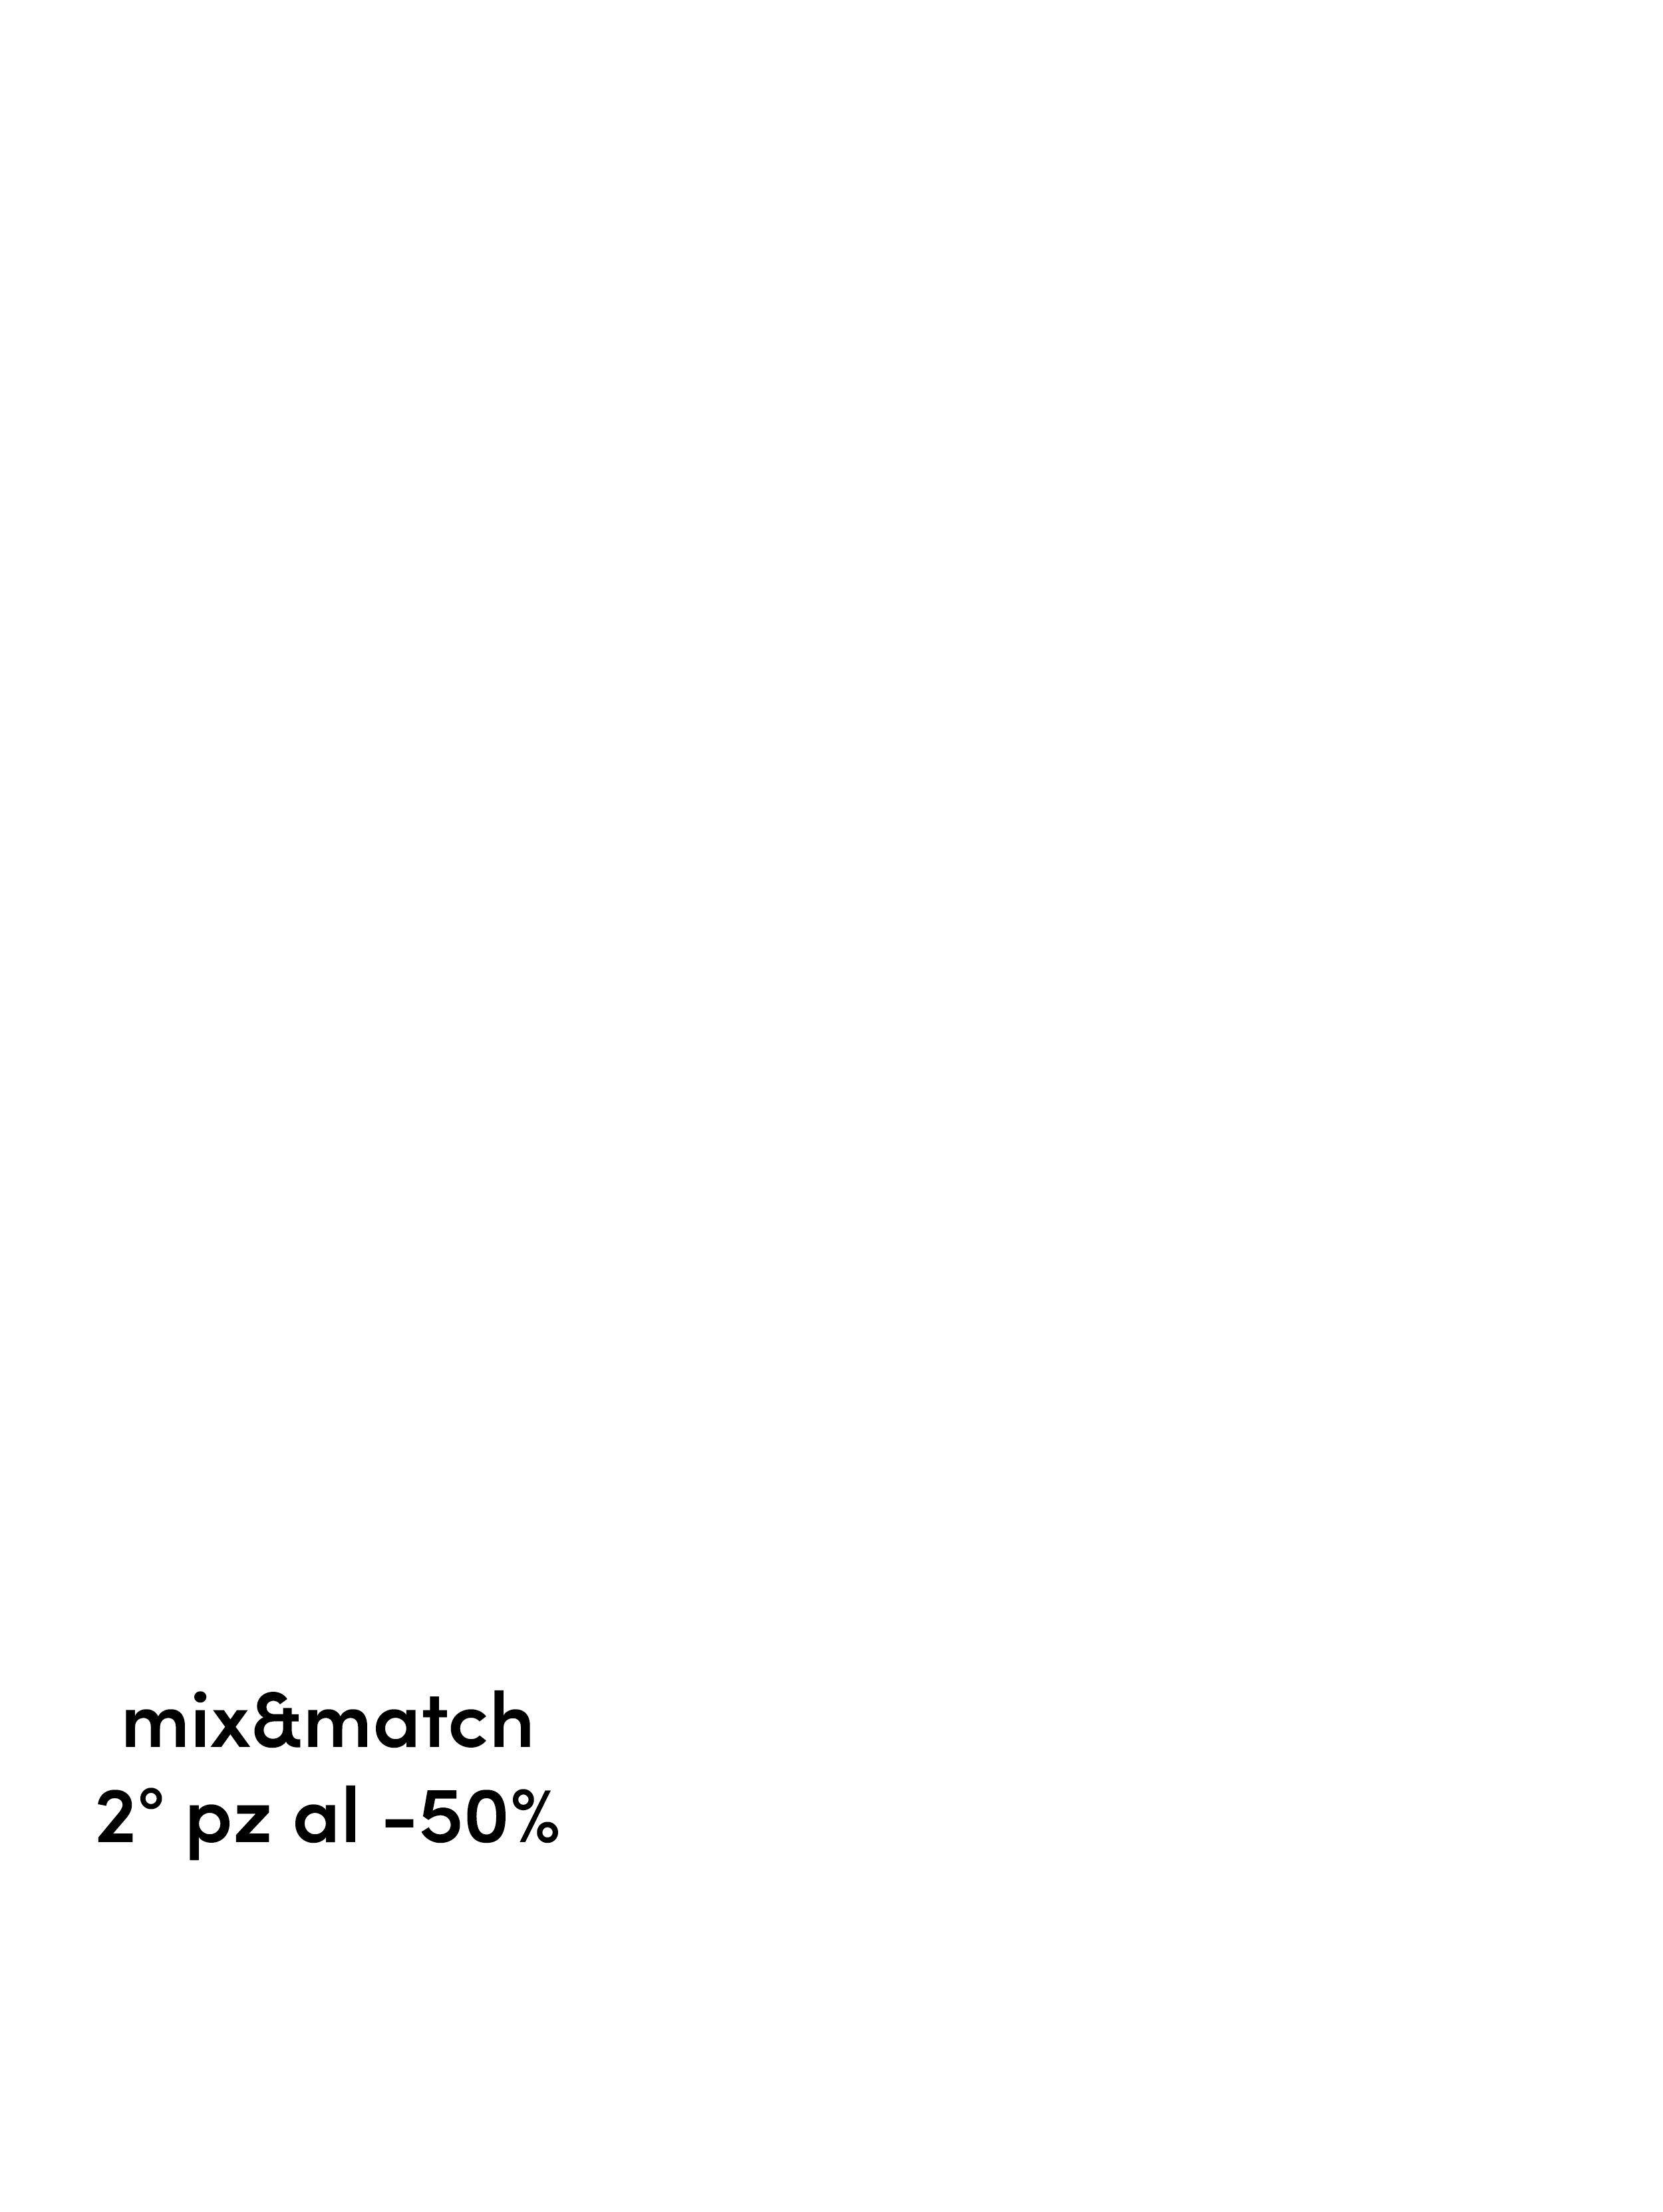 mix&match pigiami donna secondo al -50%